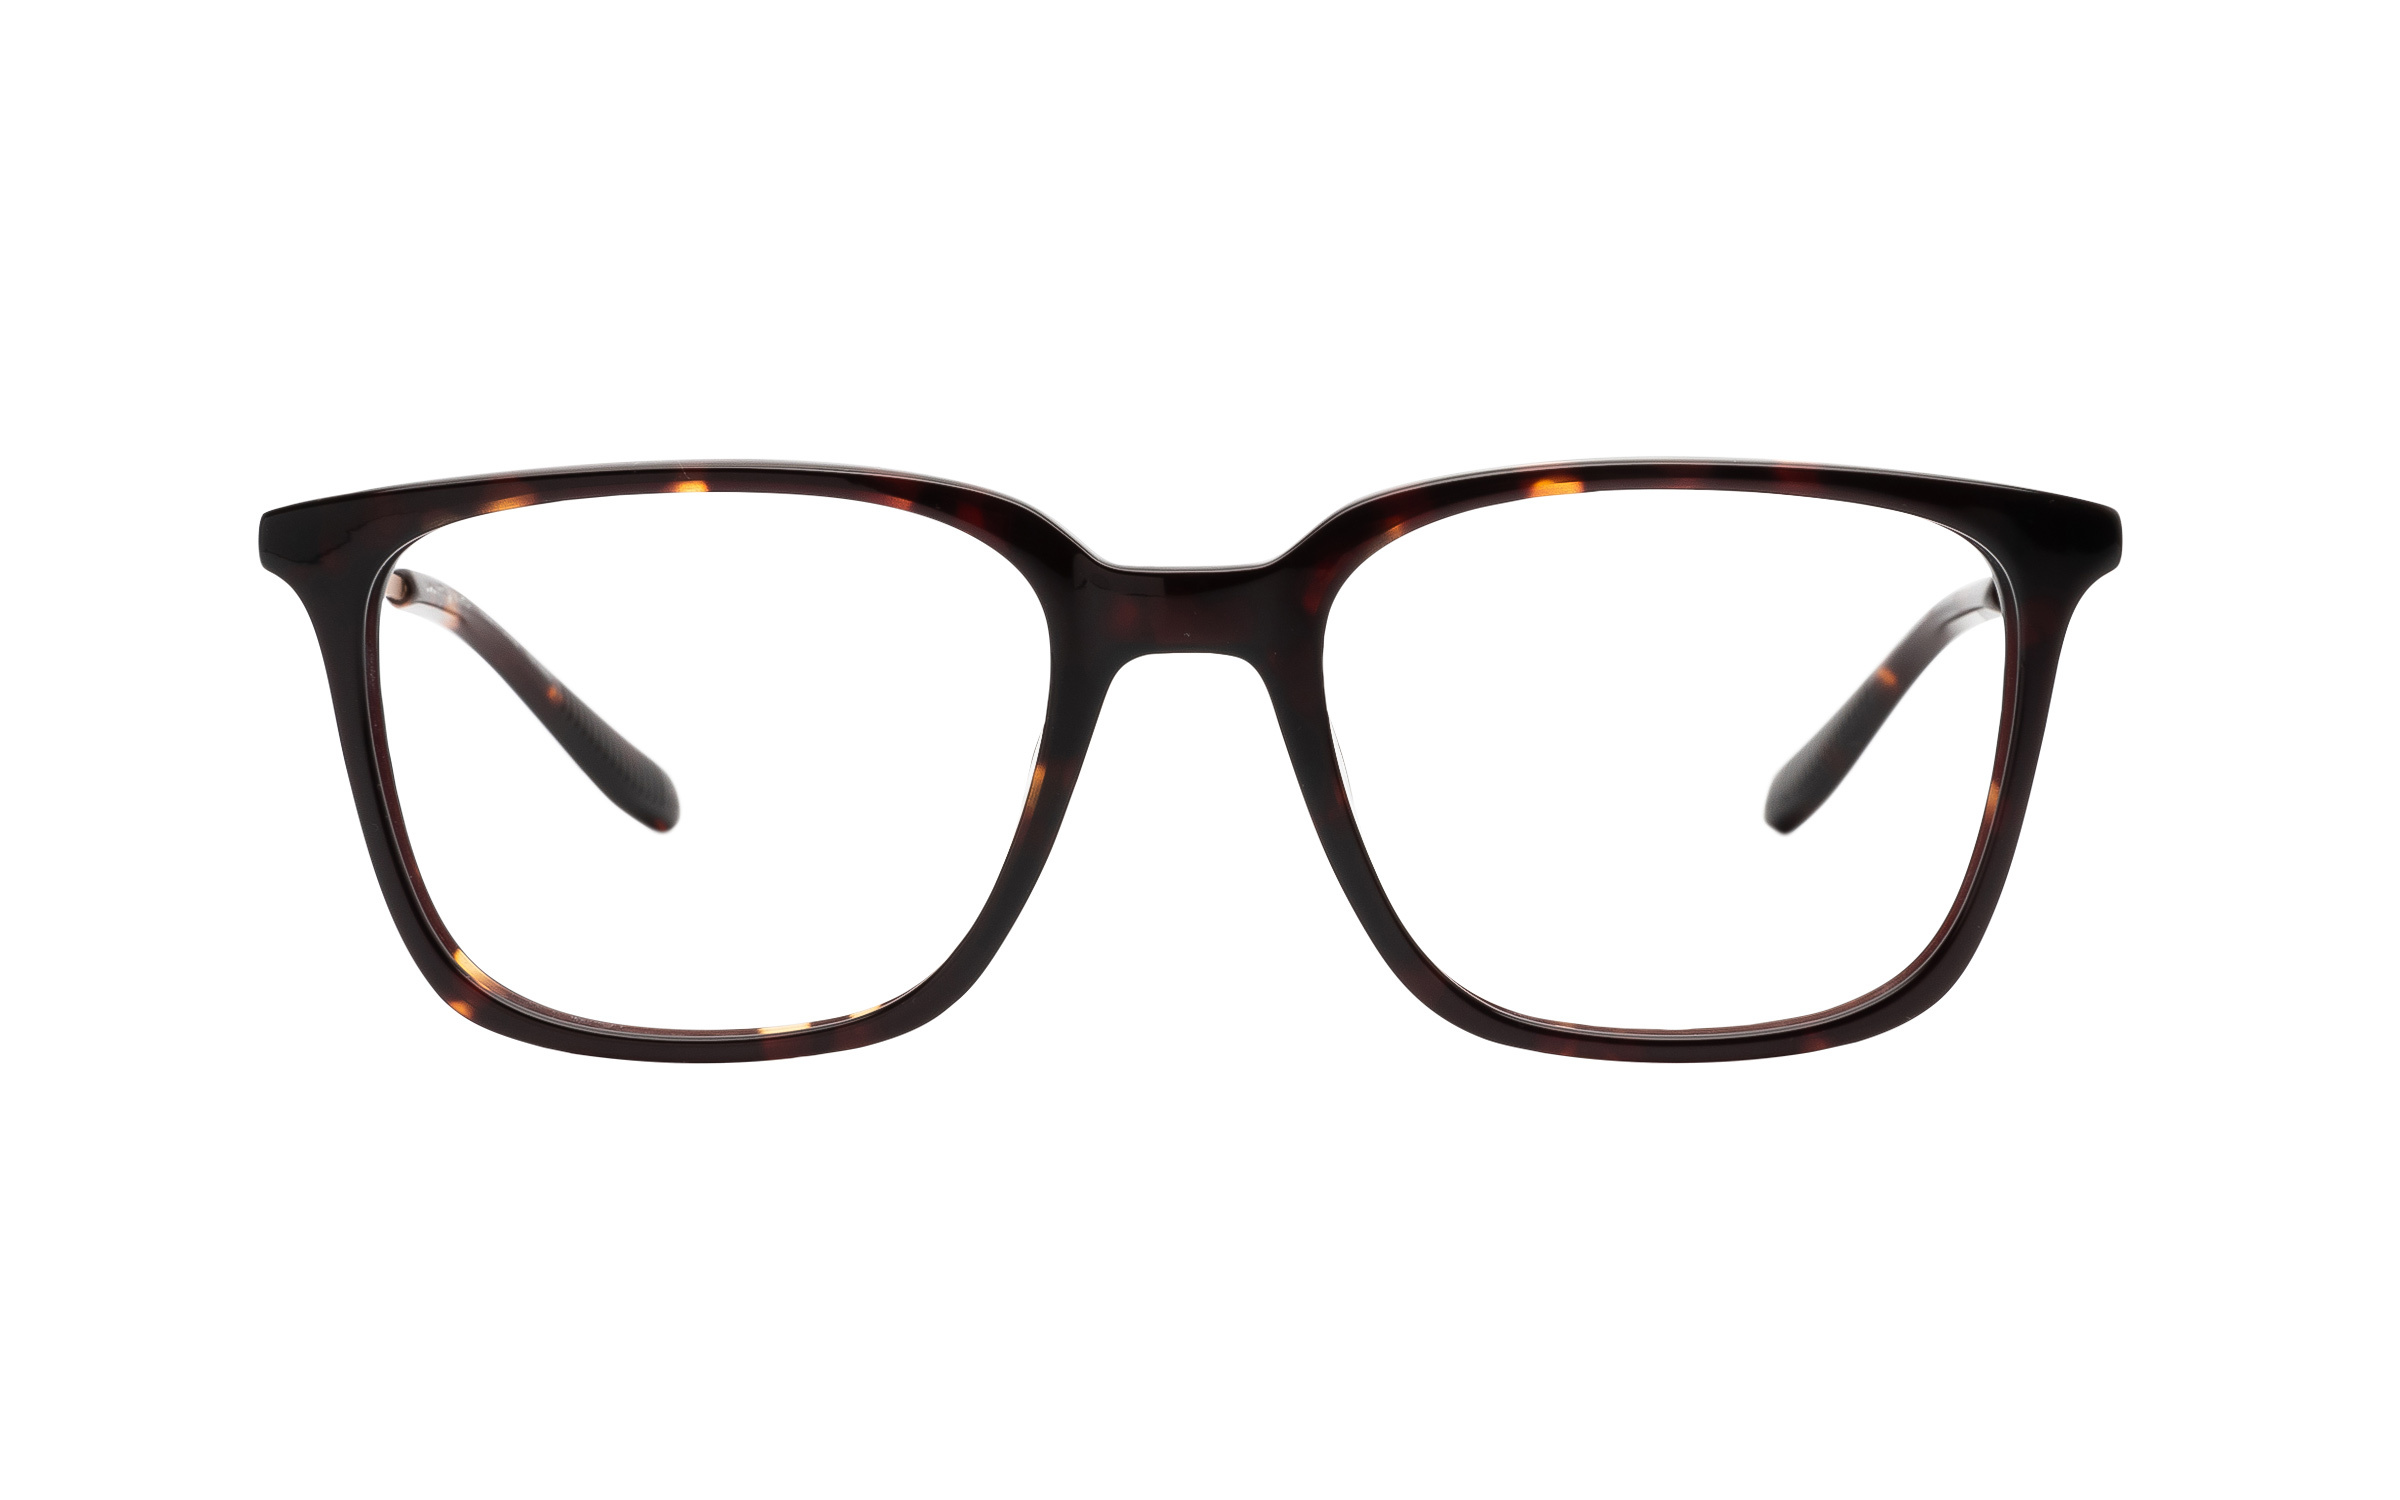 Joseph Marc Mercado (51) Eyeglasses and Frame in Tortoise | Acetate